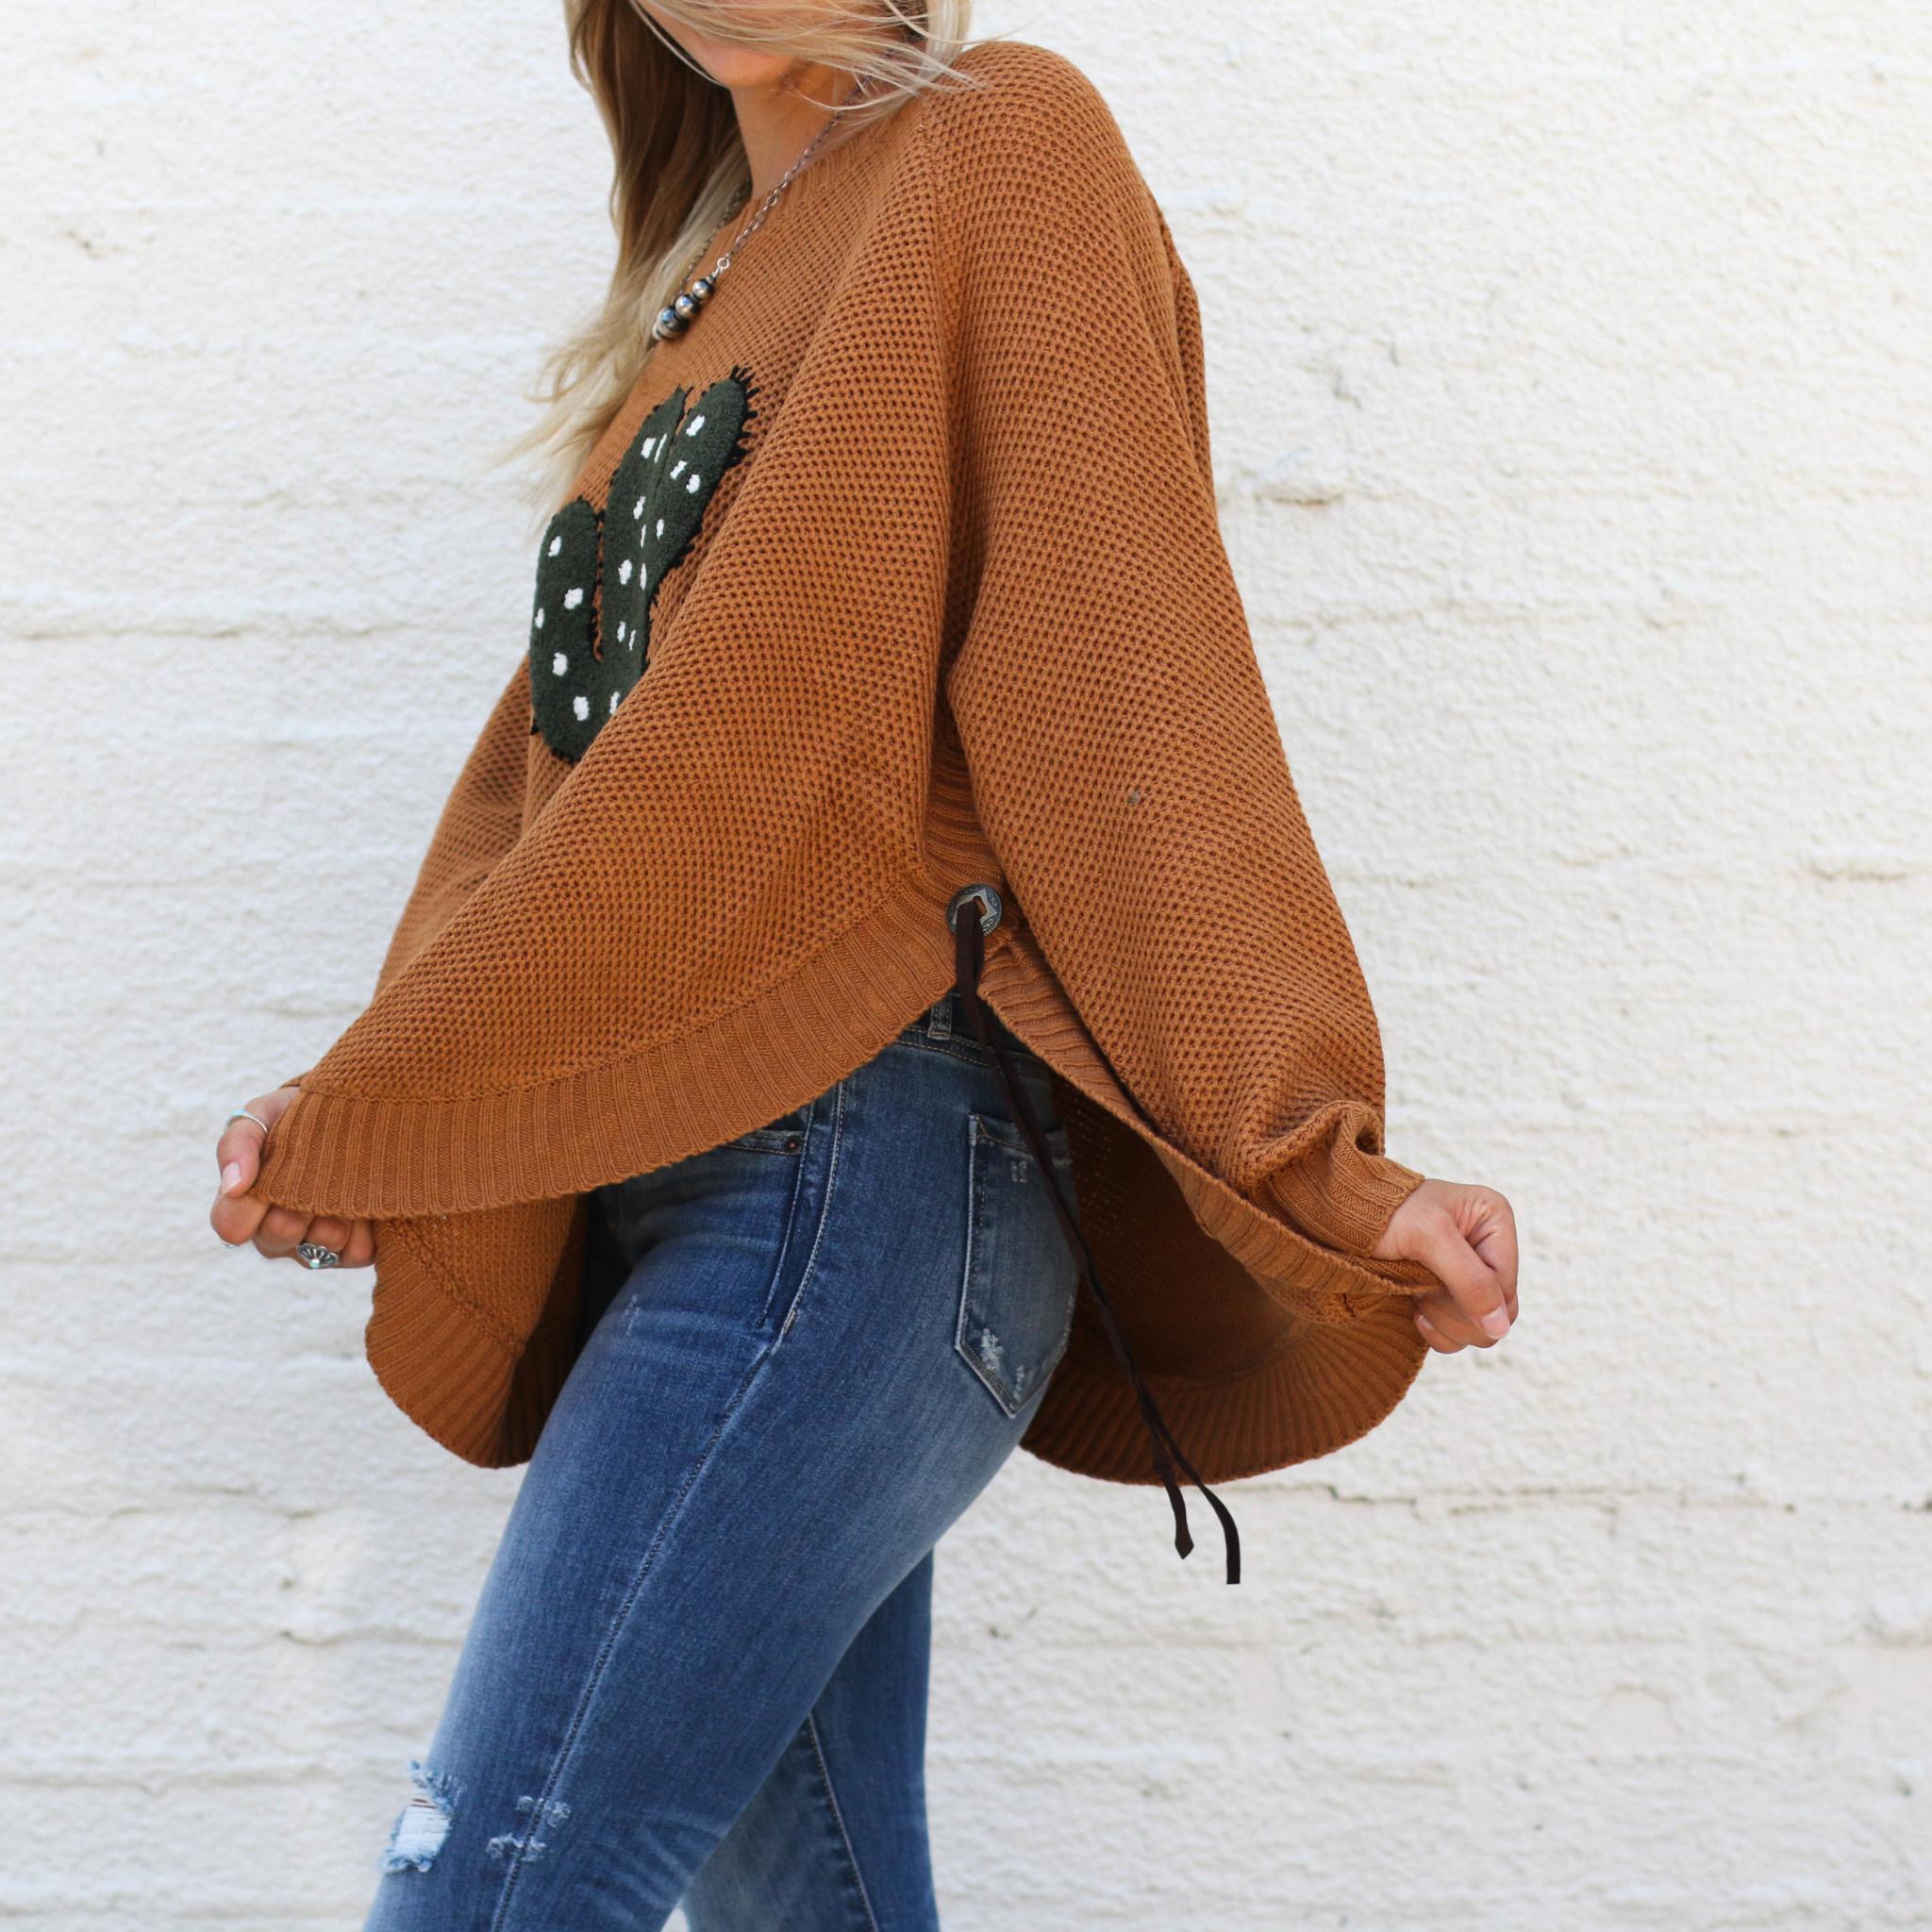 Punchy's Cactus Sweater